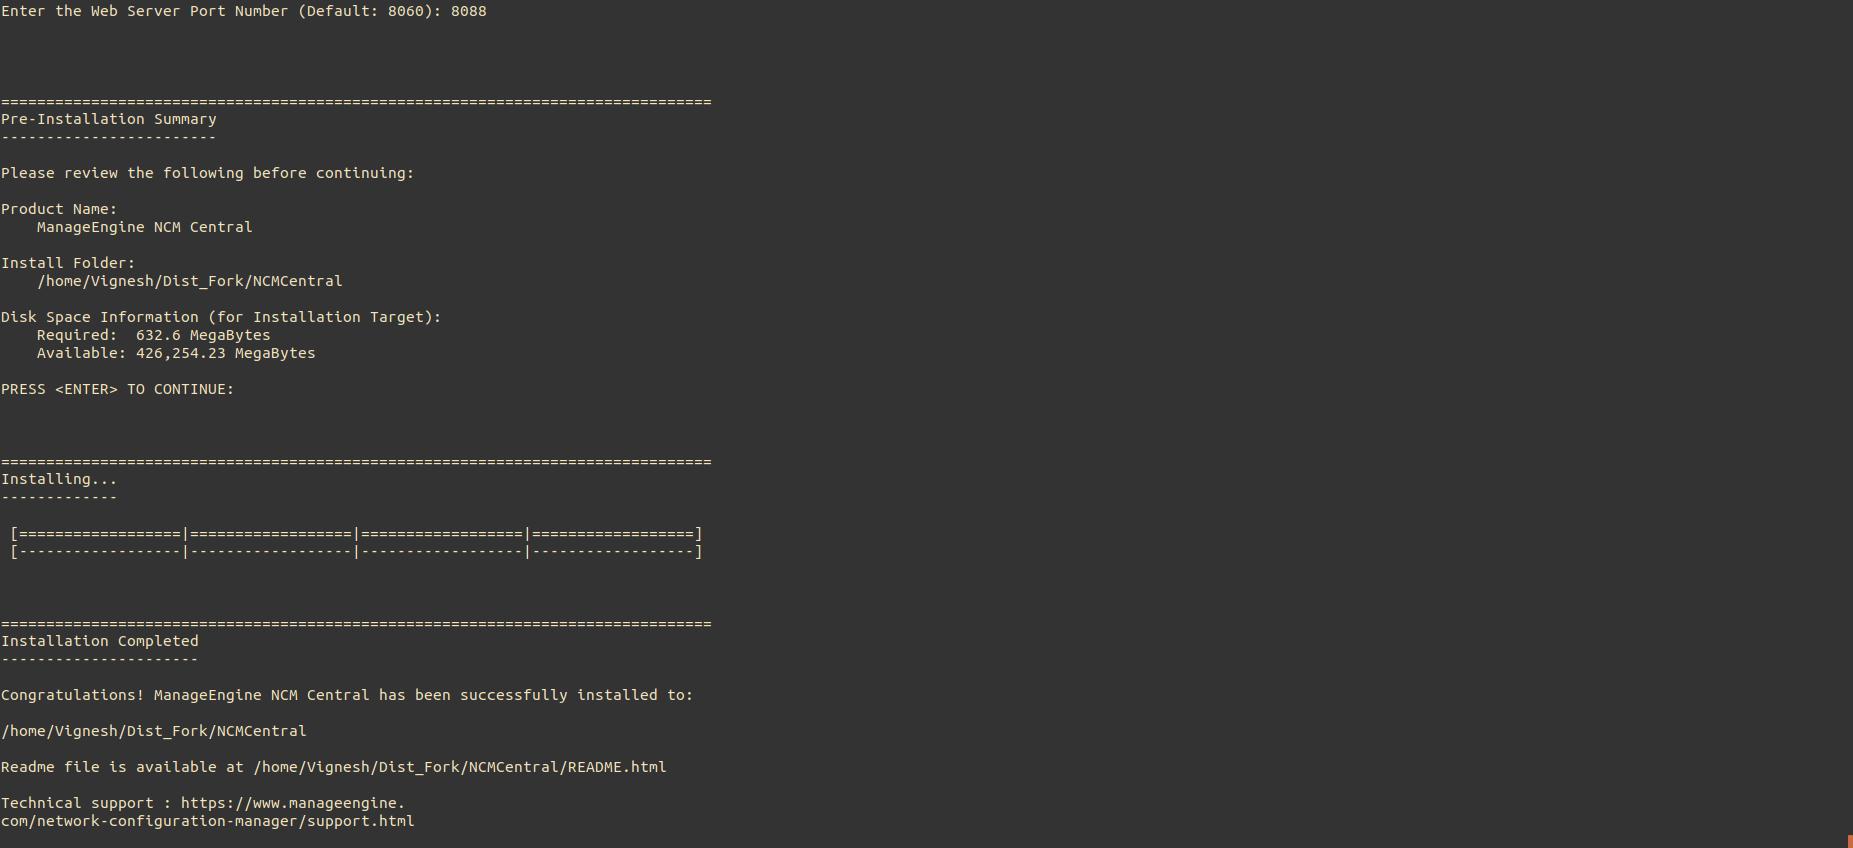 NCM Central Linux Installation Step7